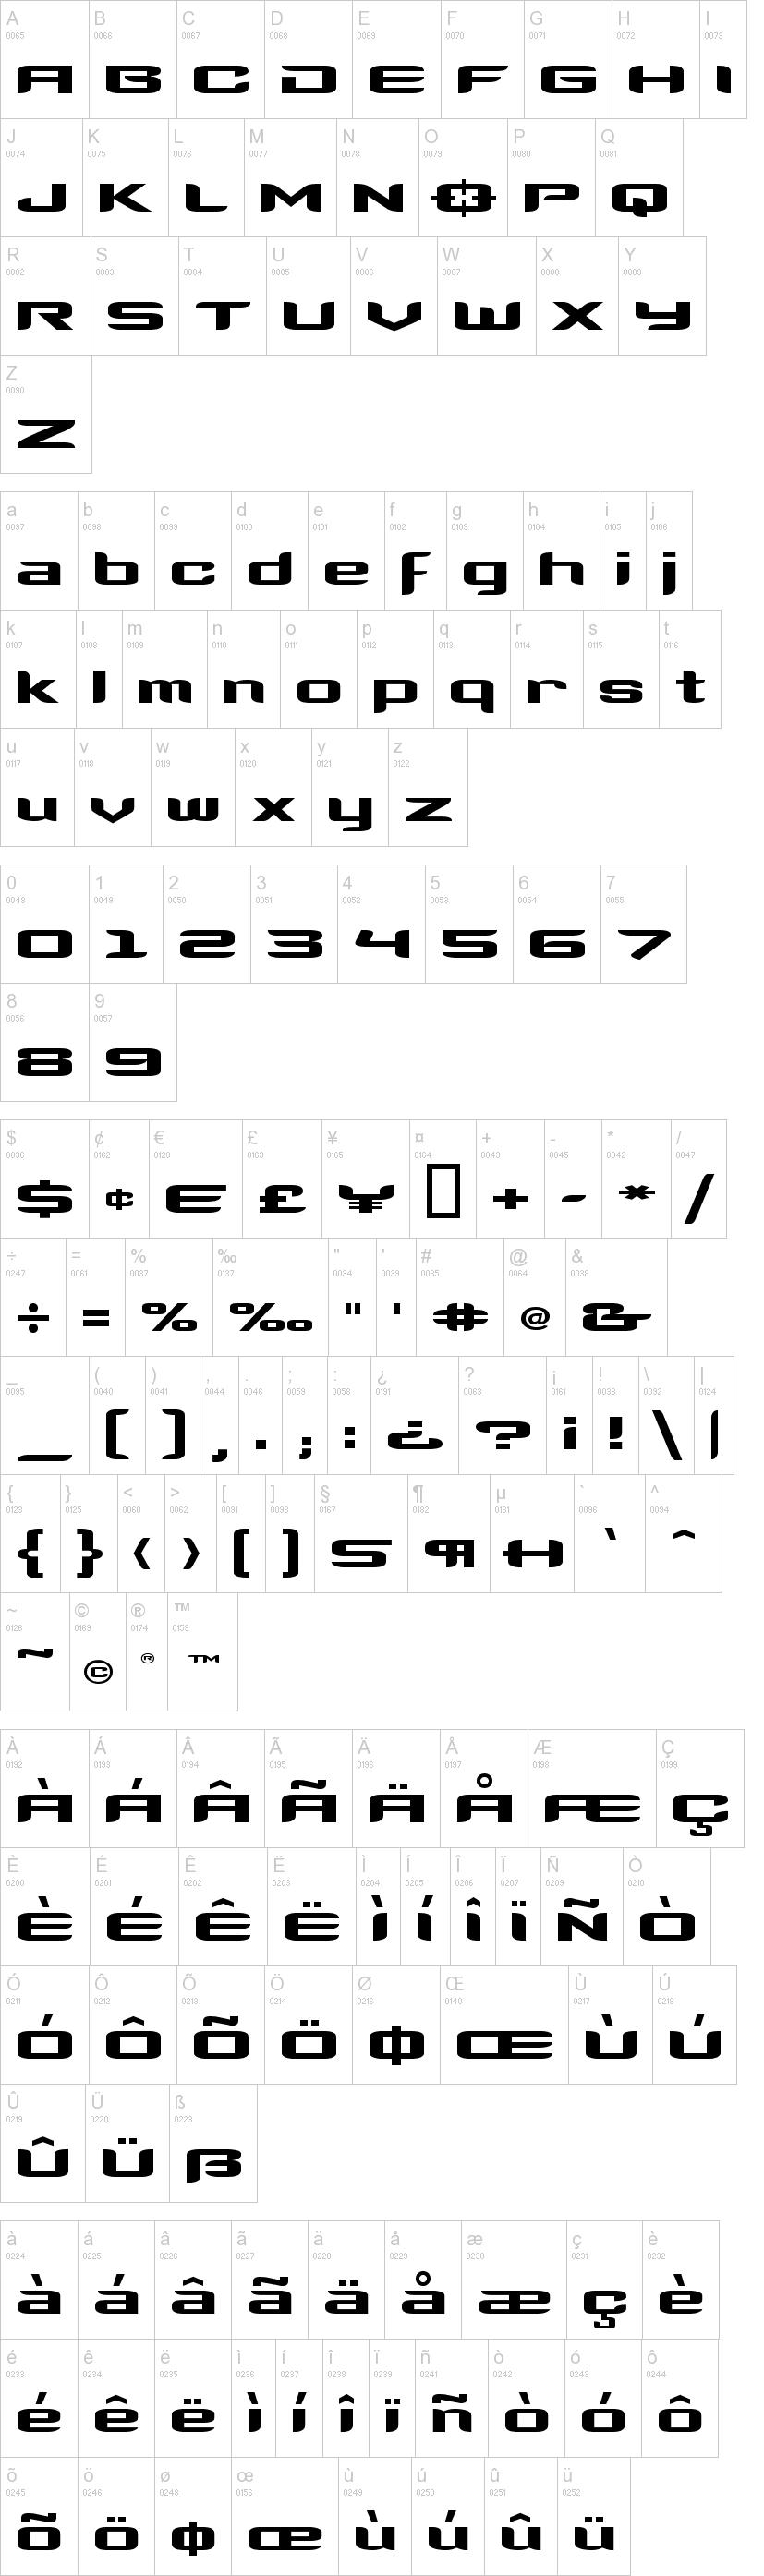 Clone Wars Font | dafont com